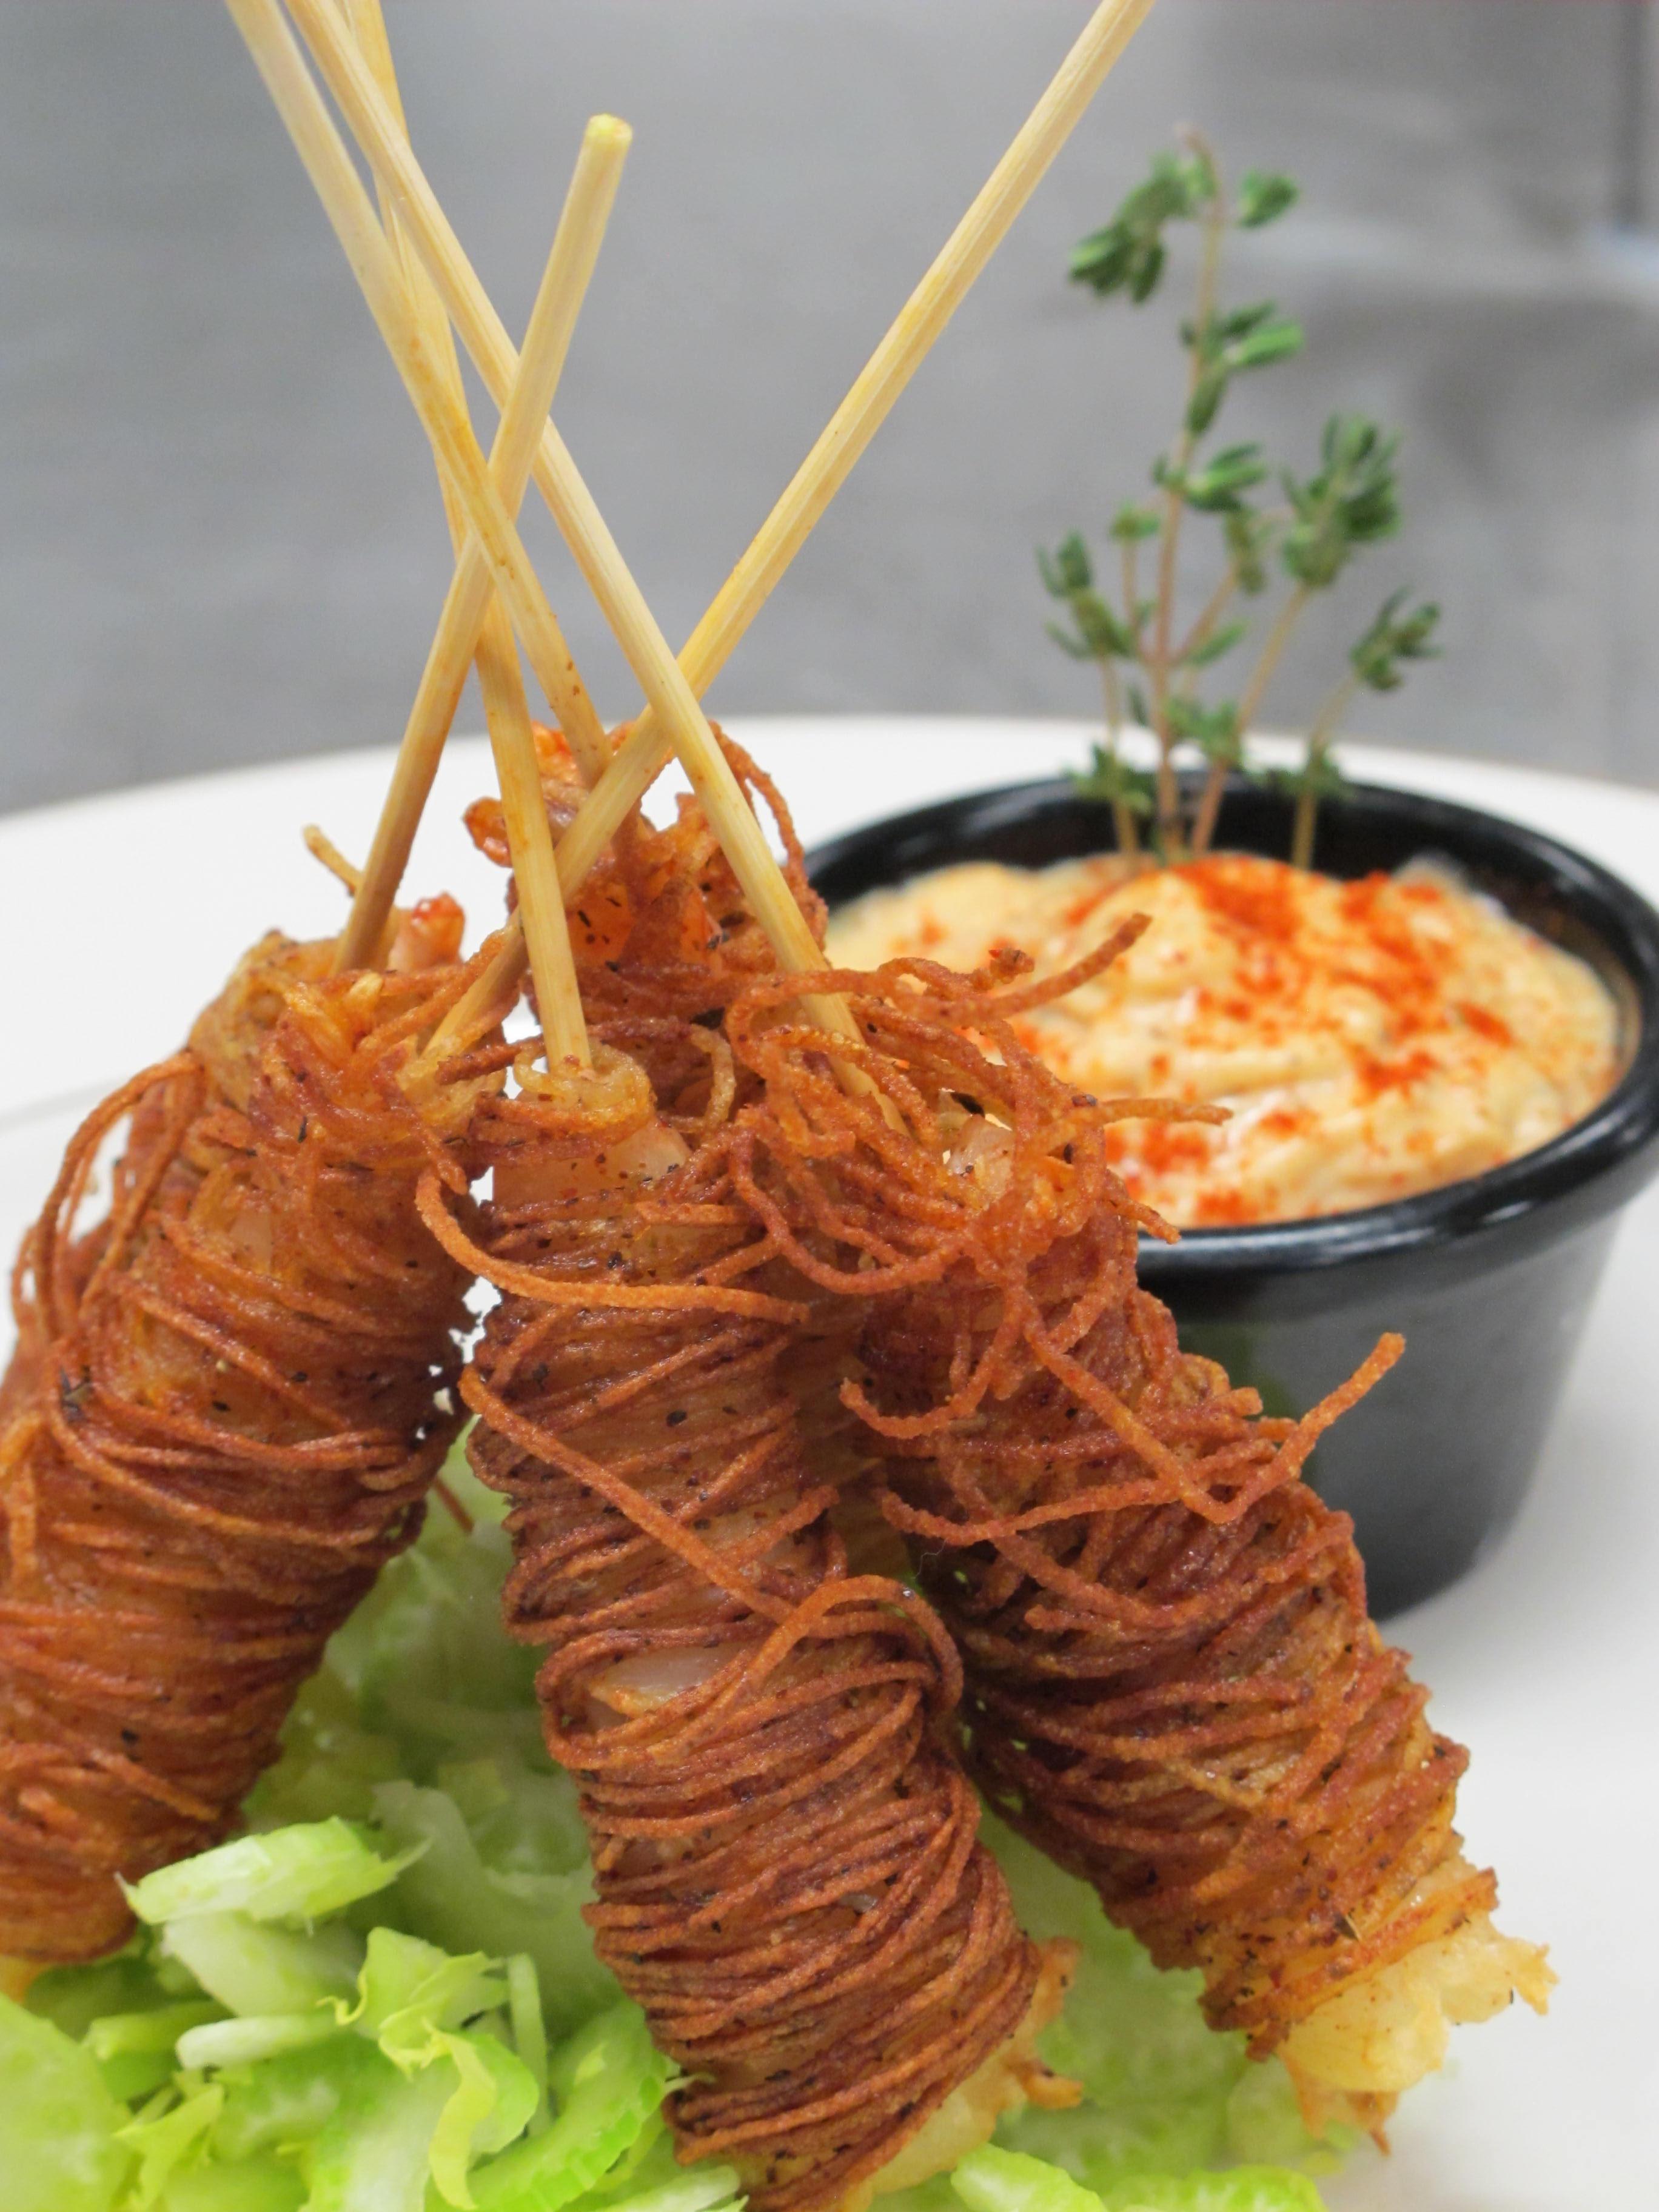 Idaho commission russetwrapped shrimp. Appetizers clipart fried potato